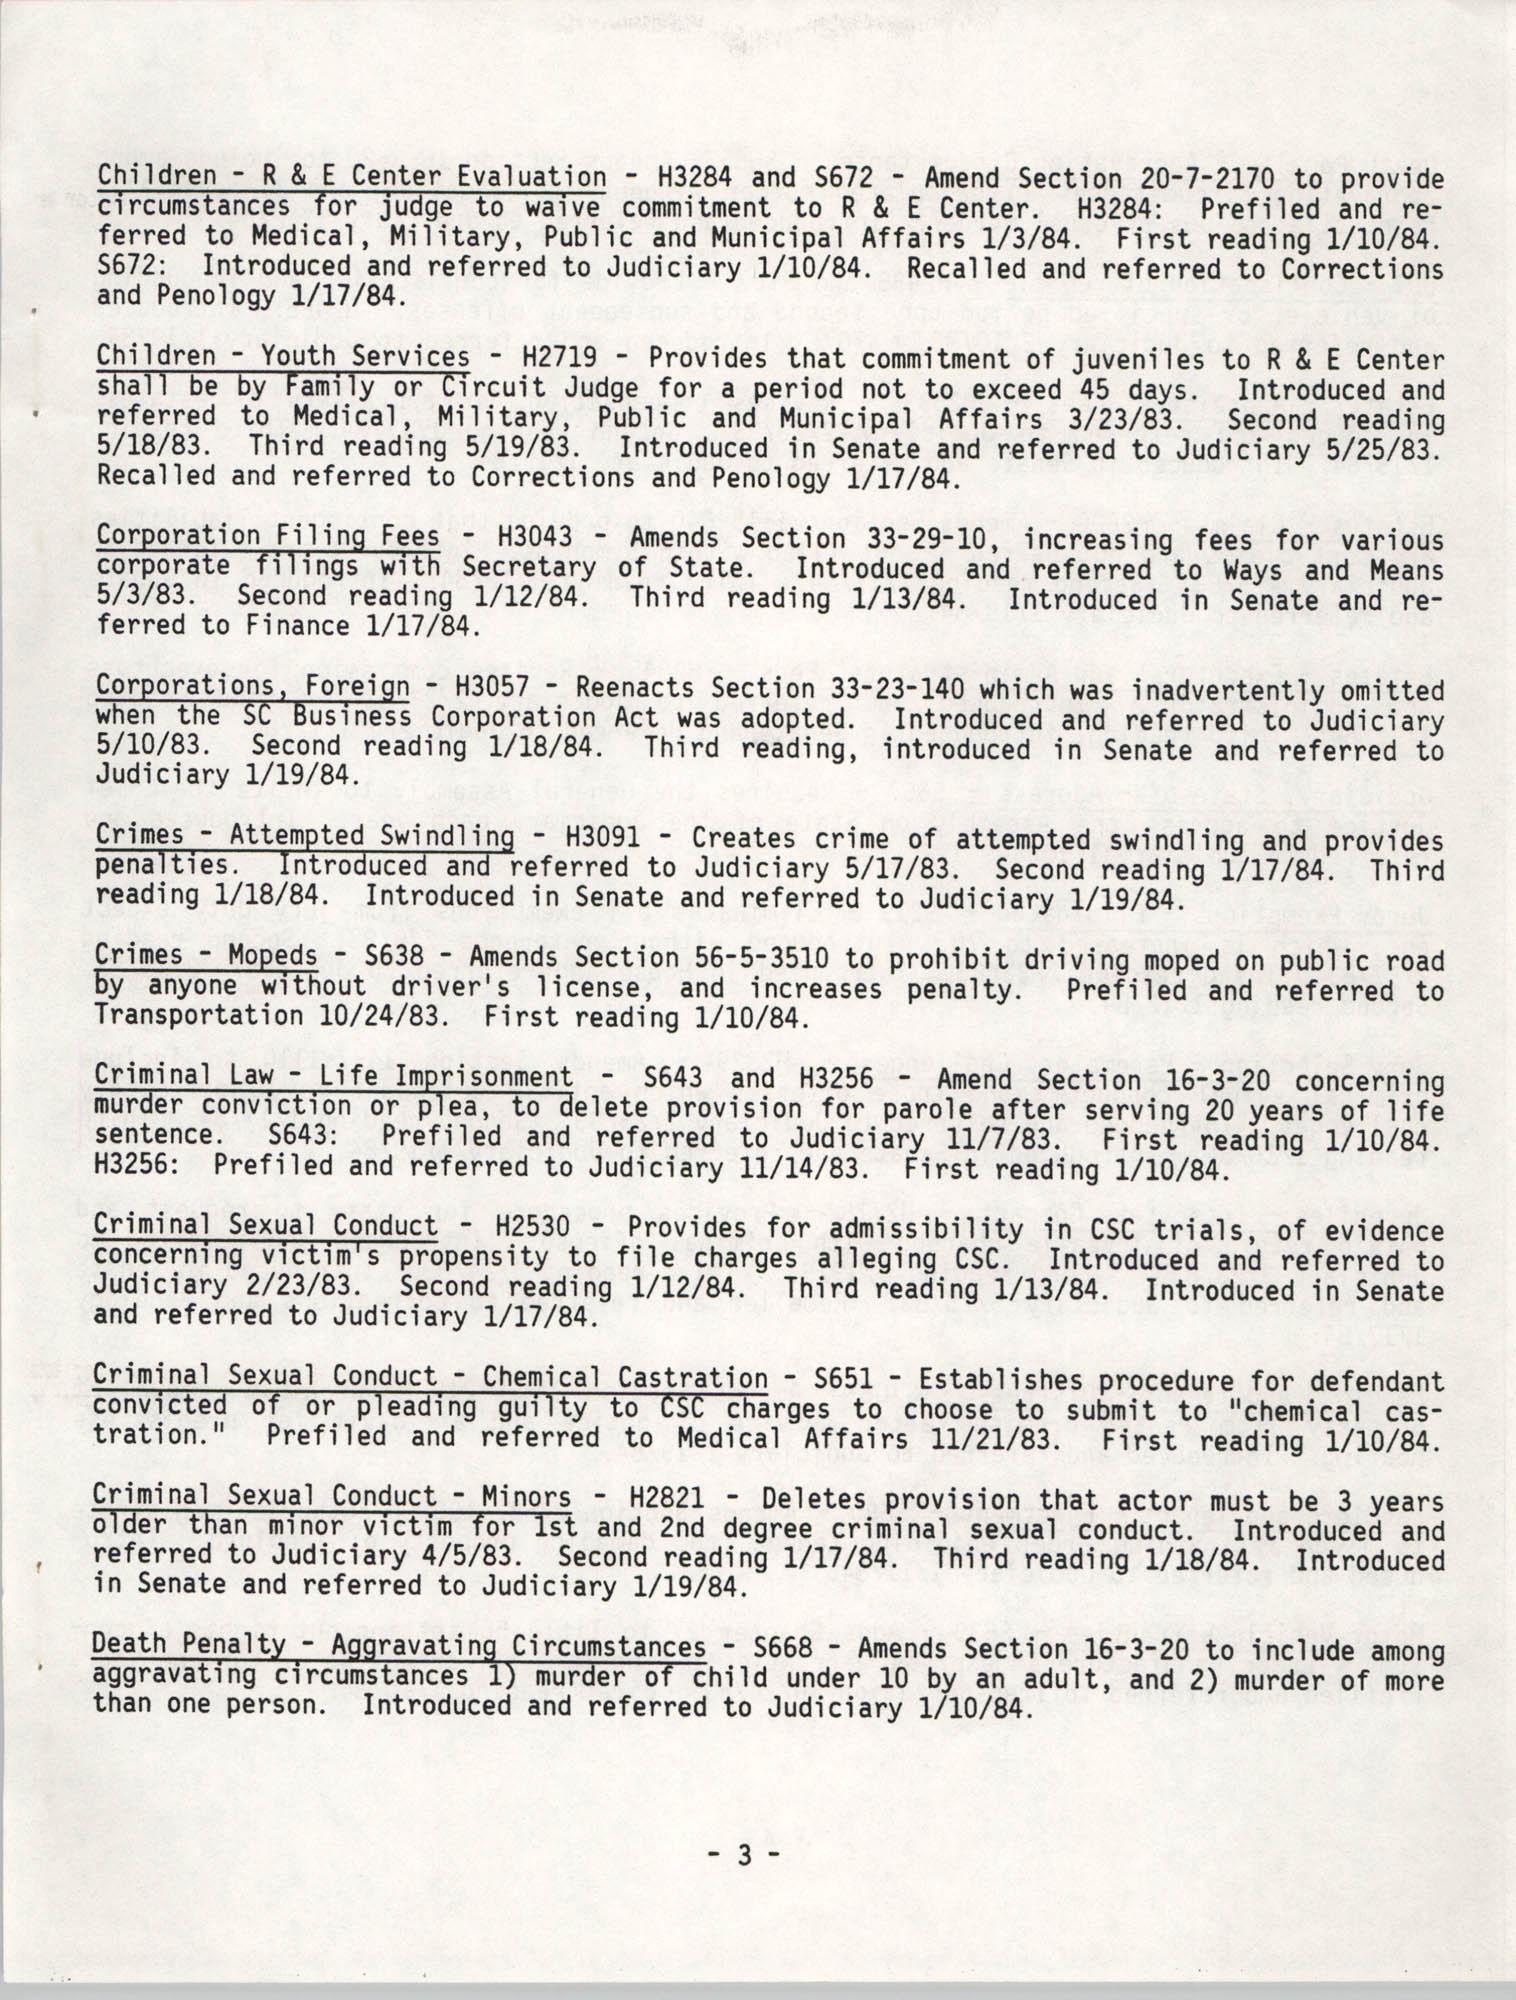 South Carolina Bar Legislative Roundup, Vol. 6 No. 1, January 26, 1984, Page 3